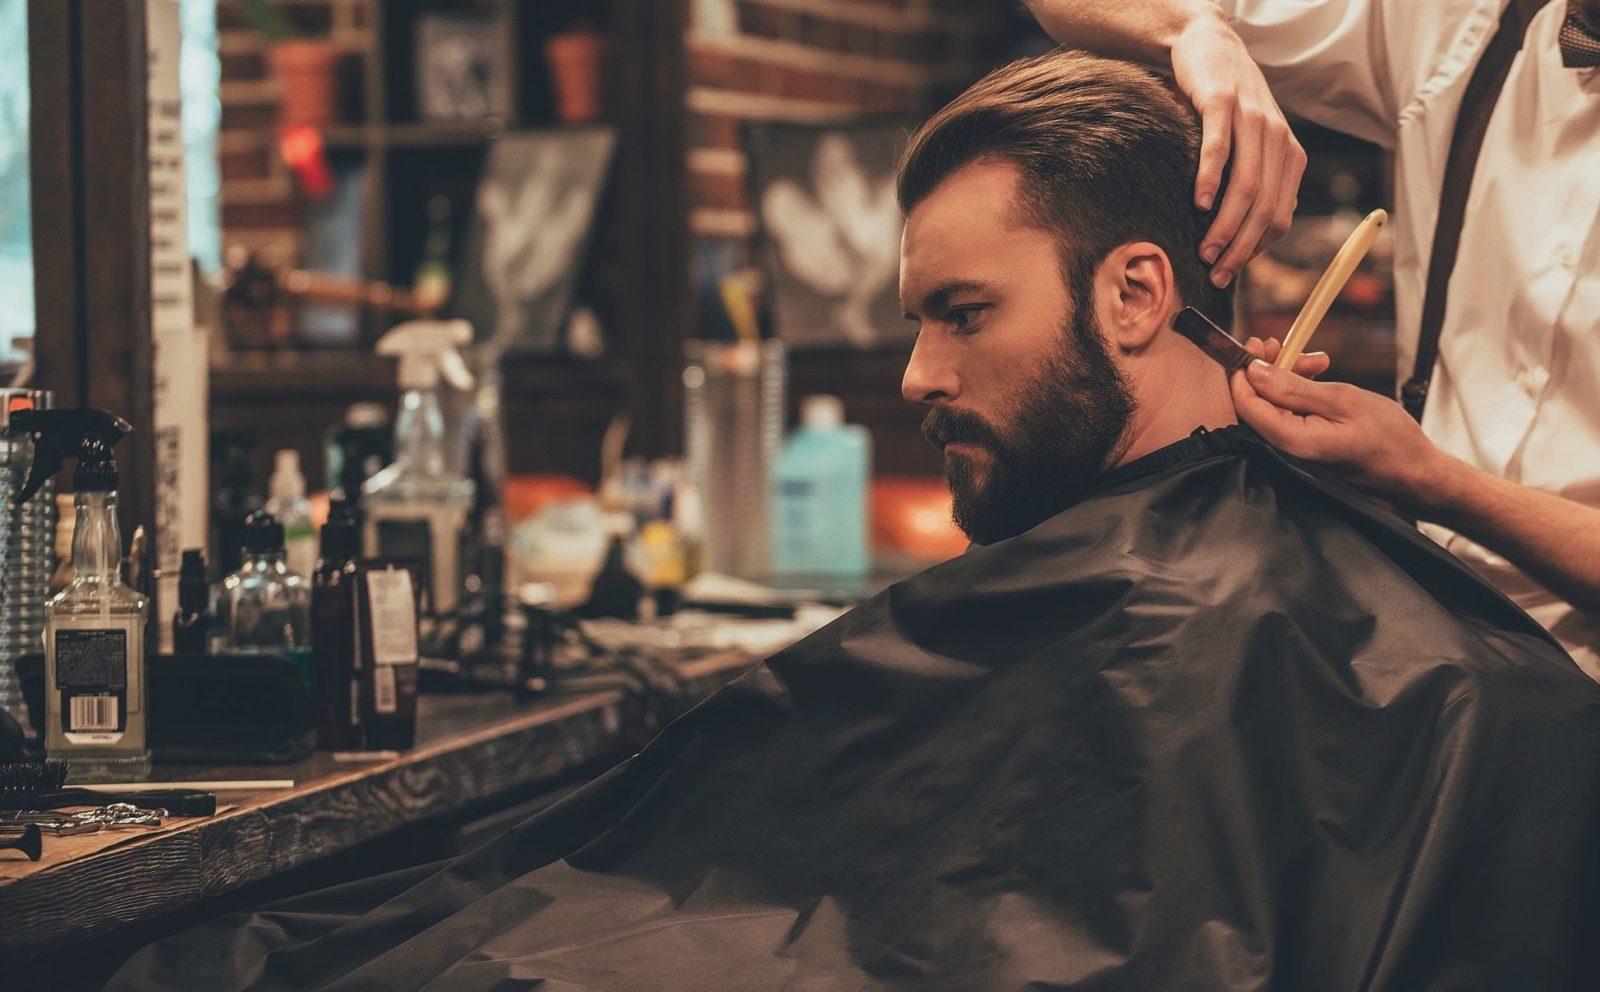 1618517351_23-p-fon-barbershop-23